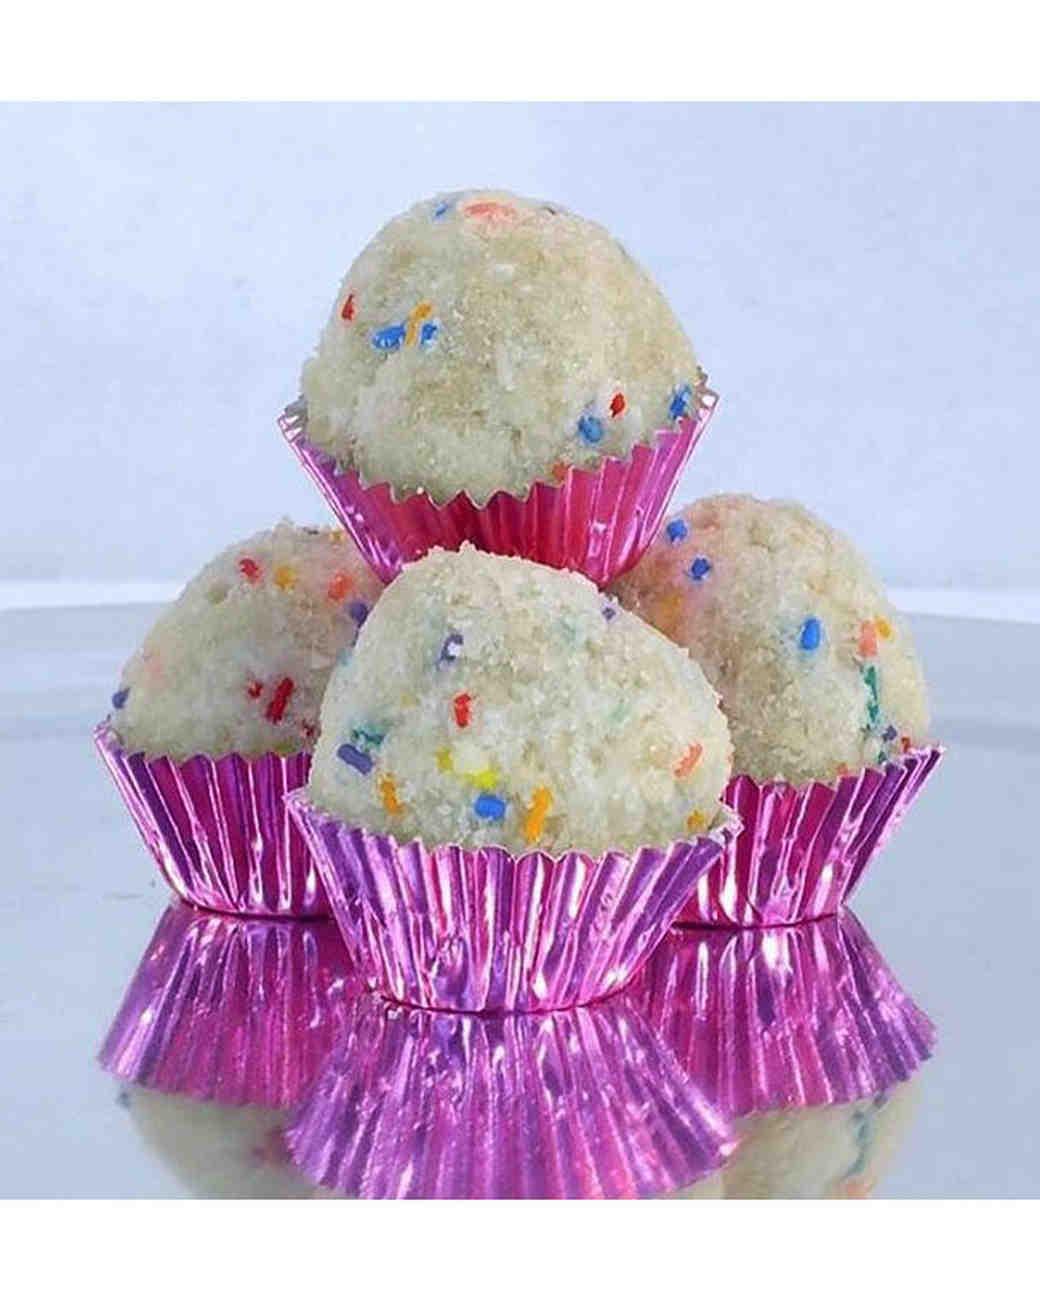 dessert-crazes-bday-cake-truffles-0316.jpg